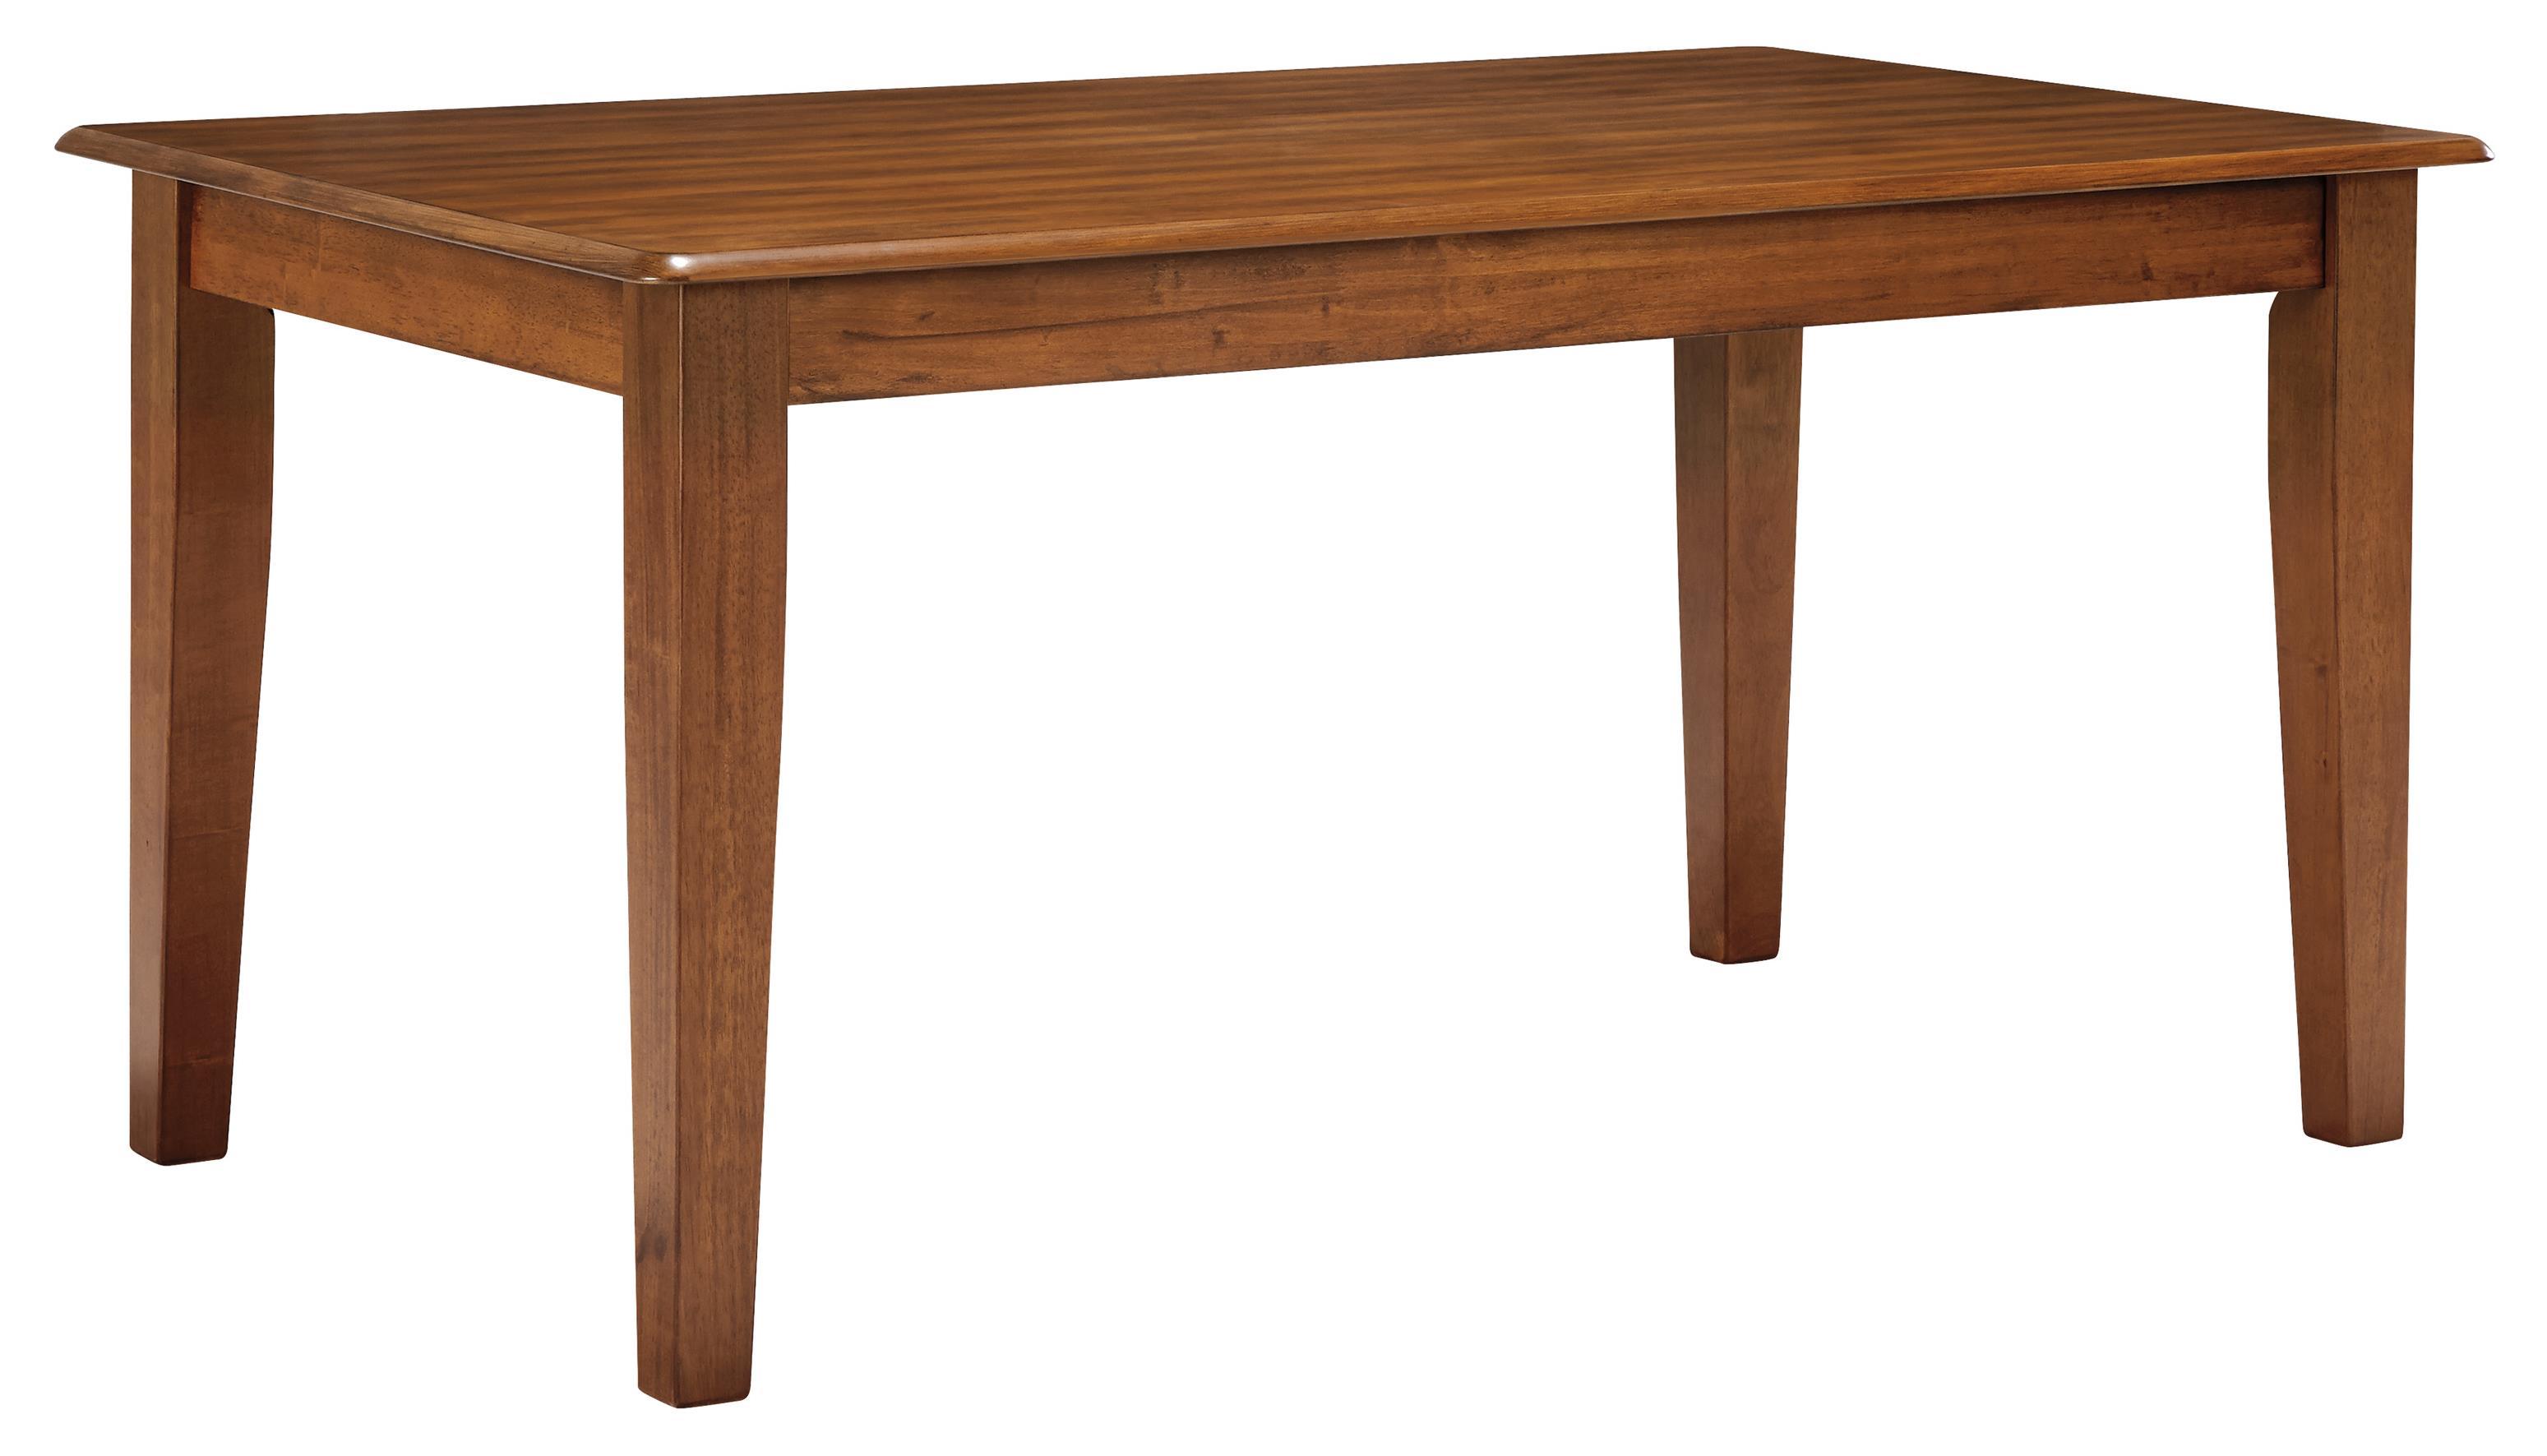 Berringer Rectangular Kitchen Table by Ashley Furniture at Sparks HomeStore